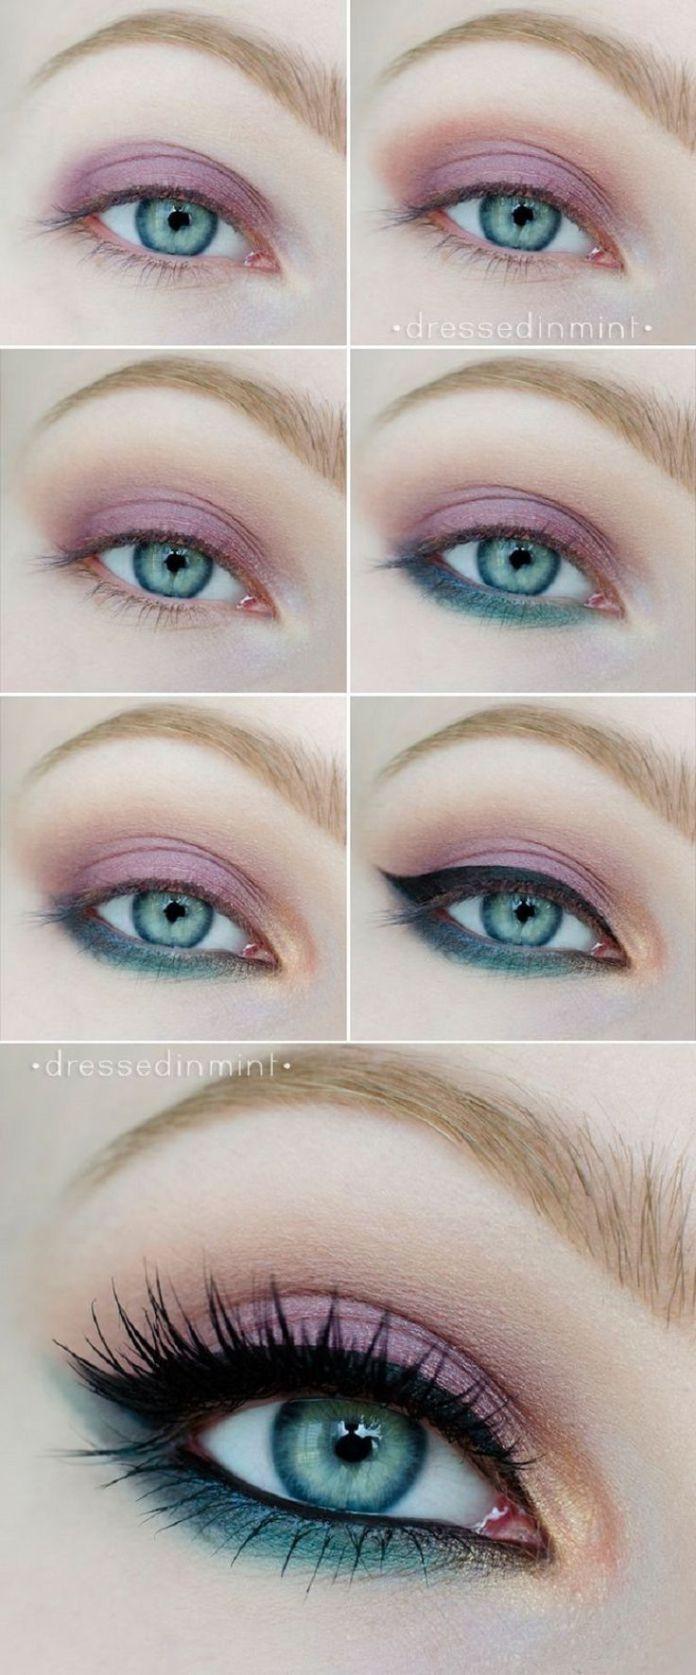 DIY Makeup Tutorials Colorful Eye Makeup HowTo